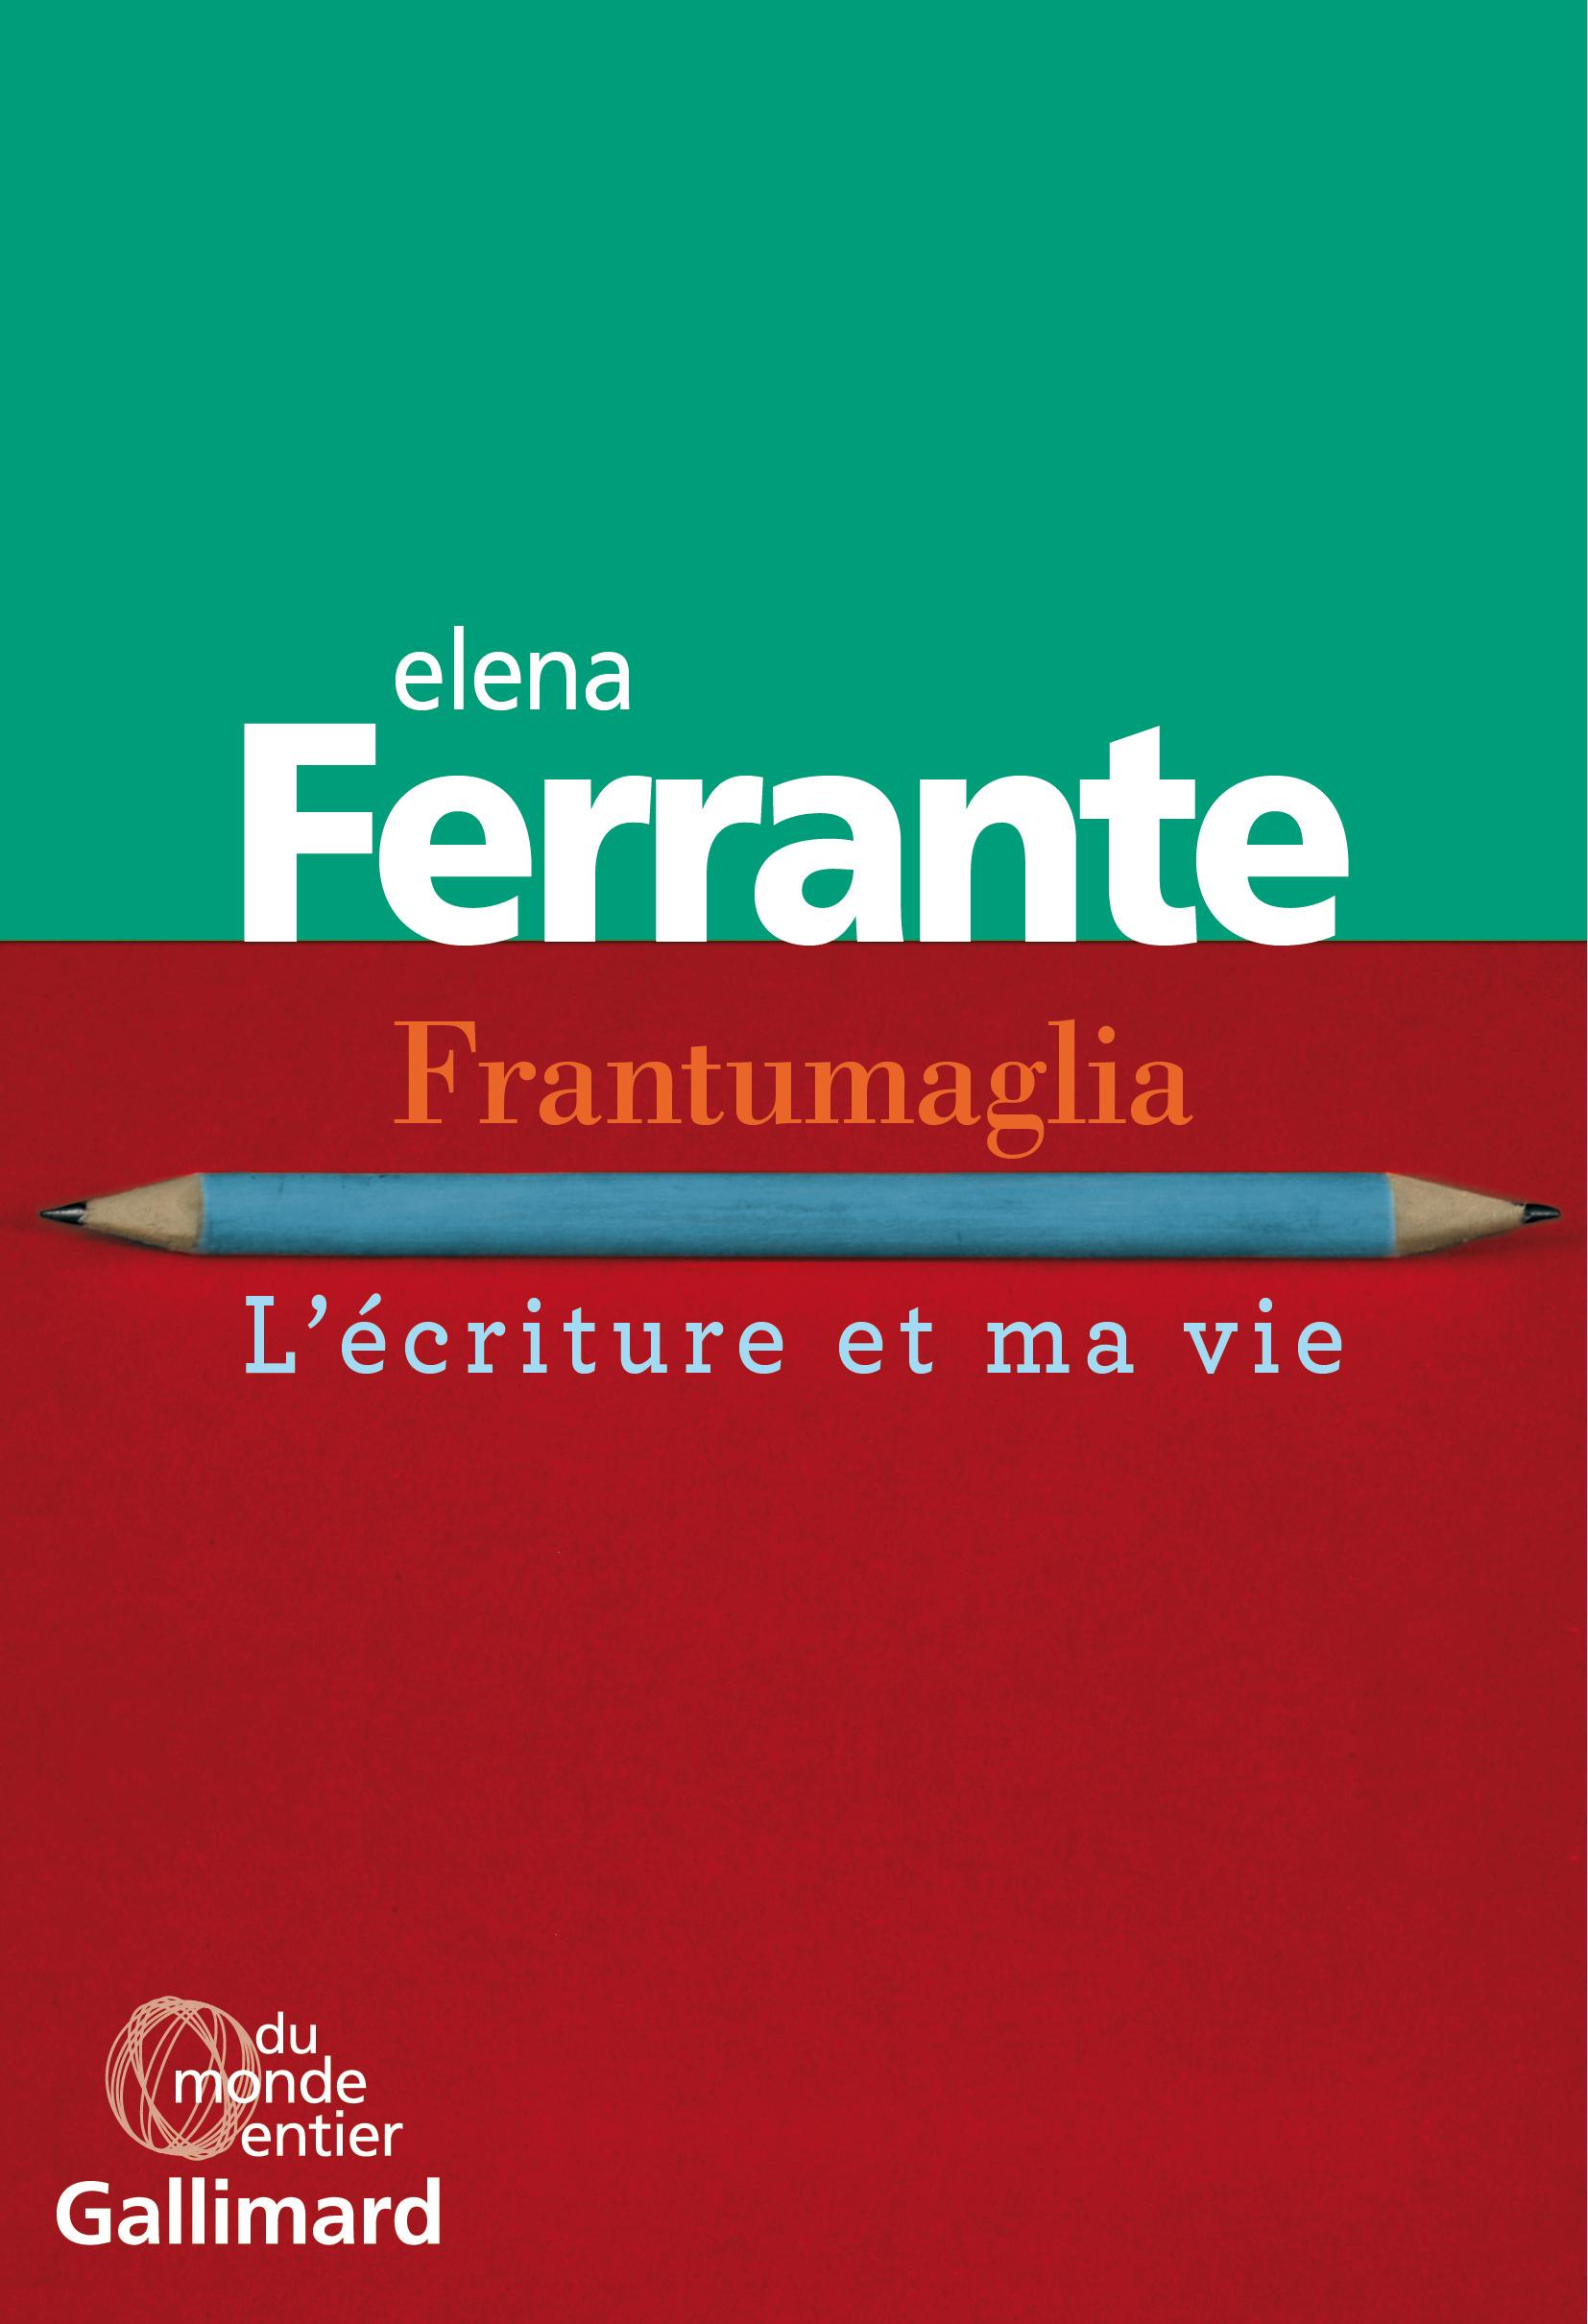 FRANTUMAGLIA - L'ECRITURE ET MA VIE